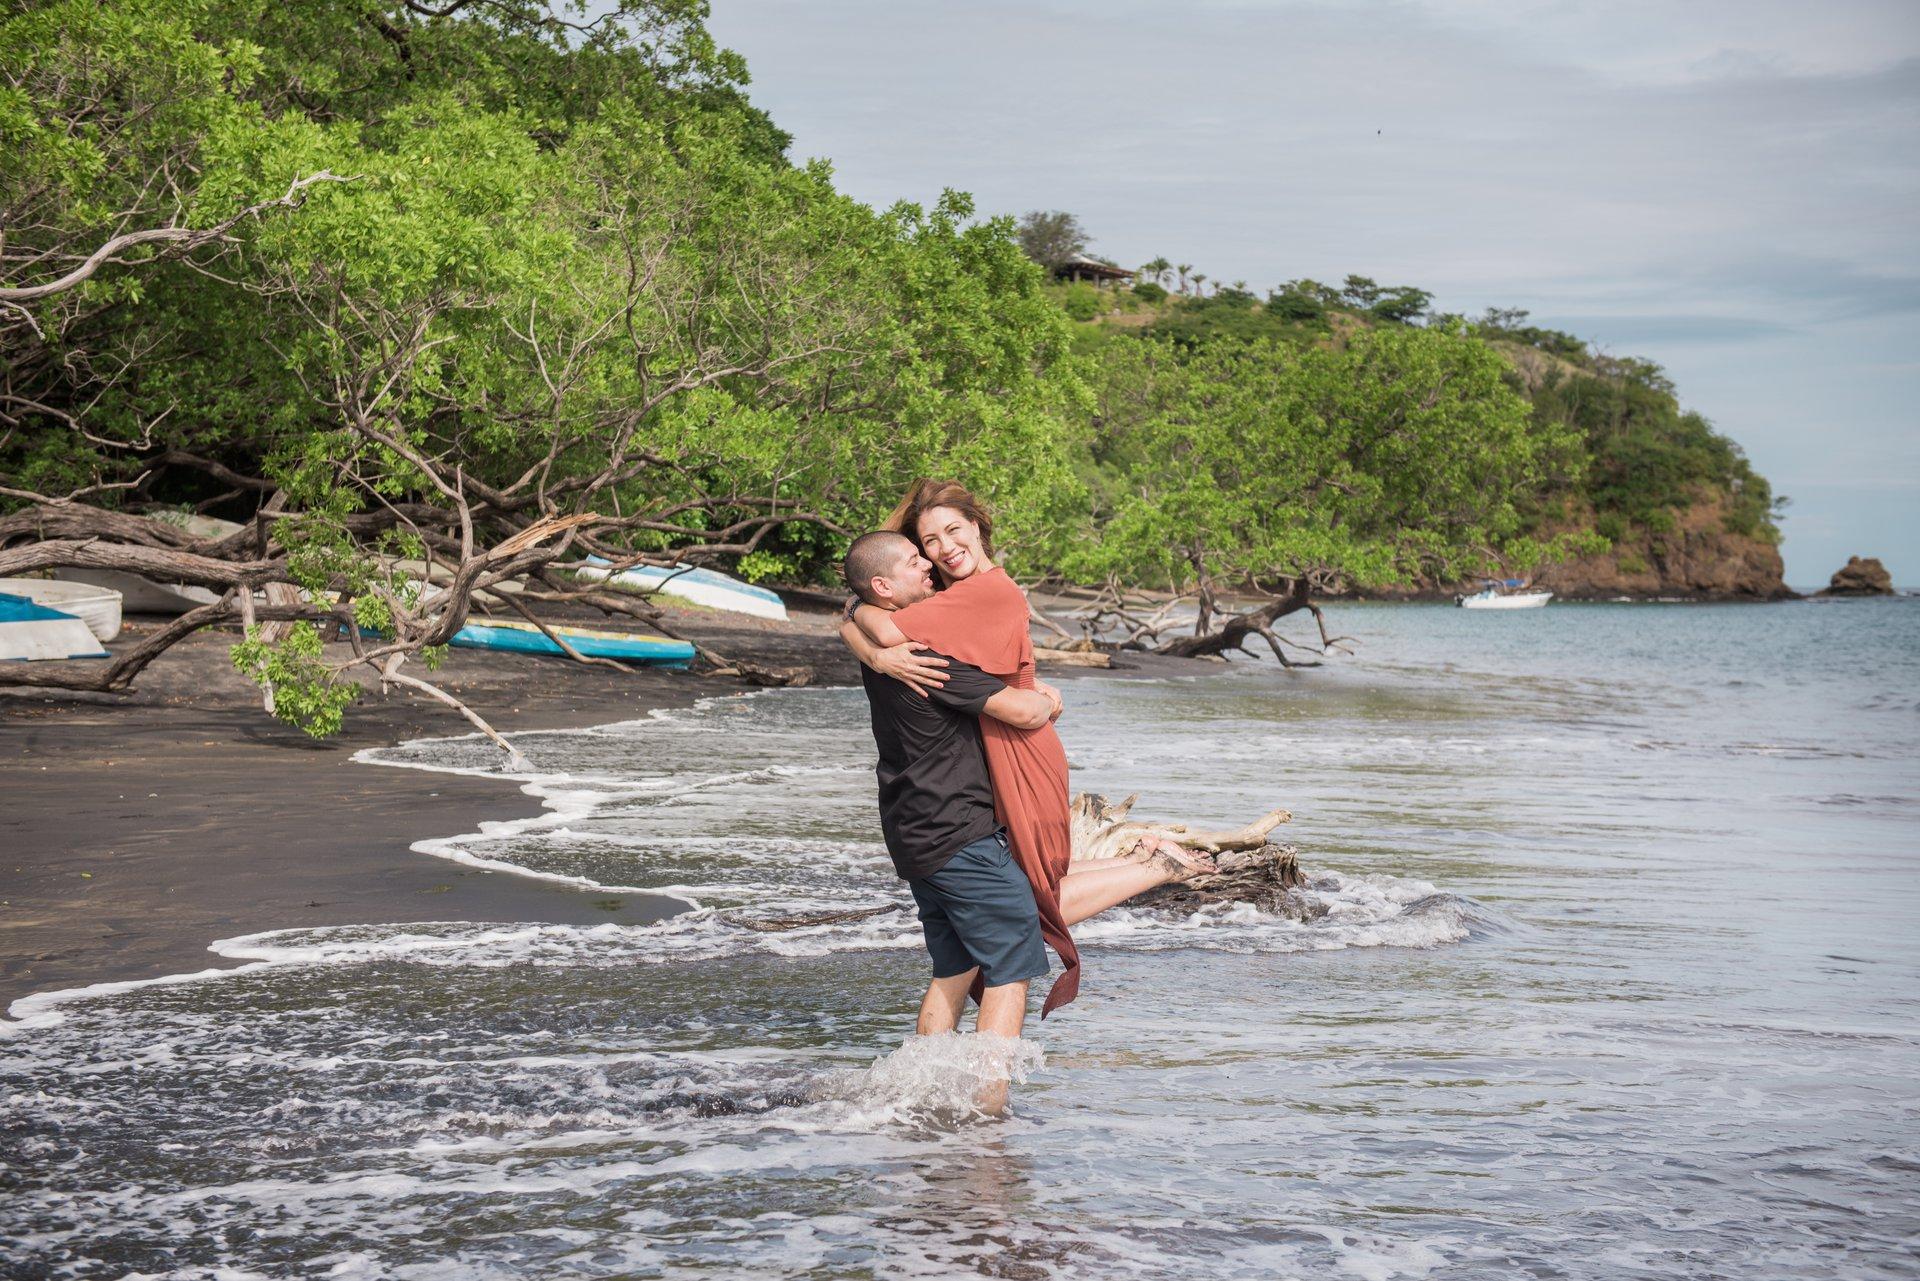 Guanacaste-Costa Rica-travel-story-Flytographer-9